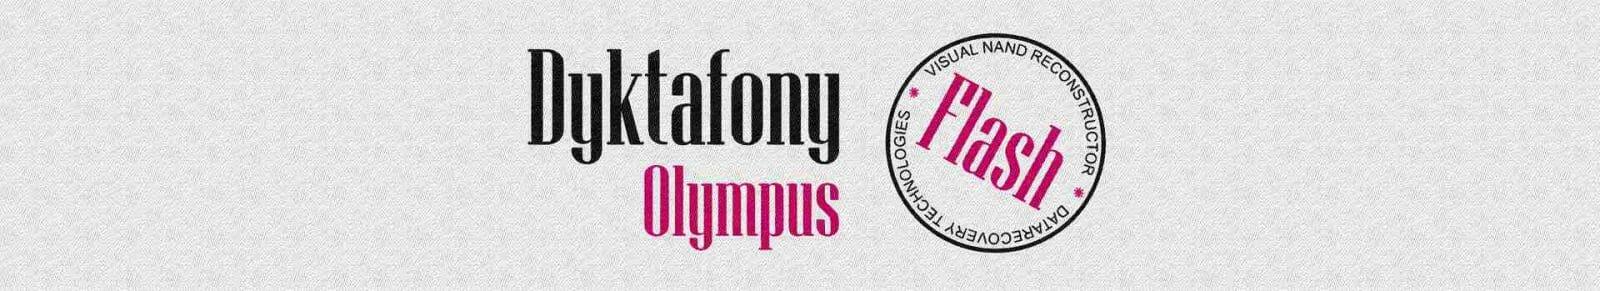 dyktafony-Olympus-2-A-1920x349 dyktafony olympus odzysk danych